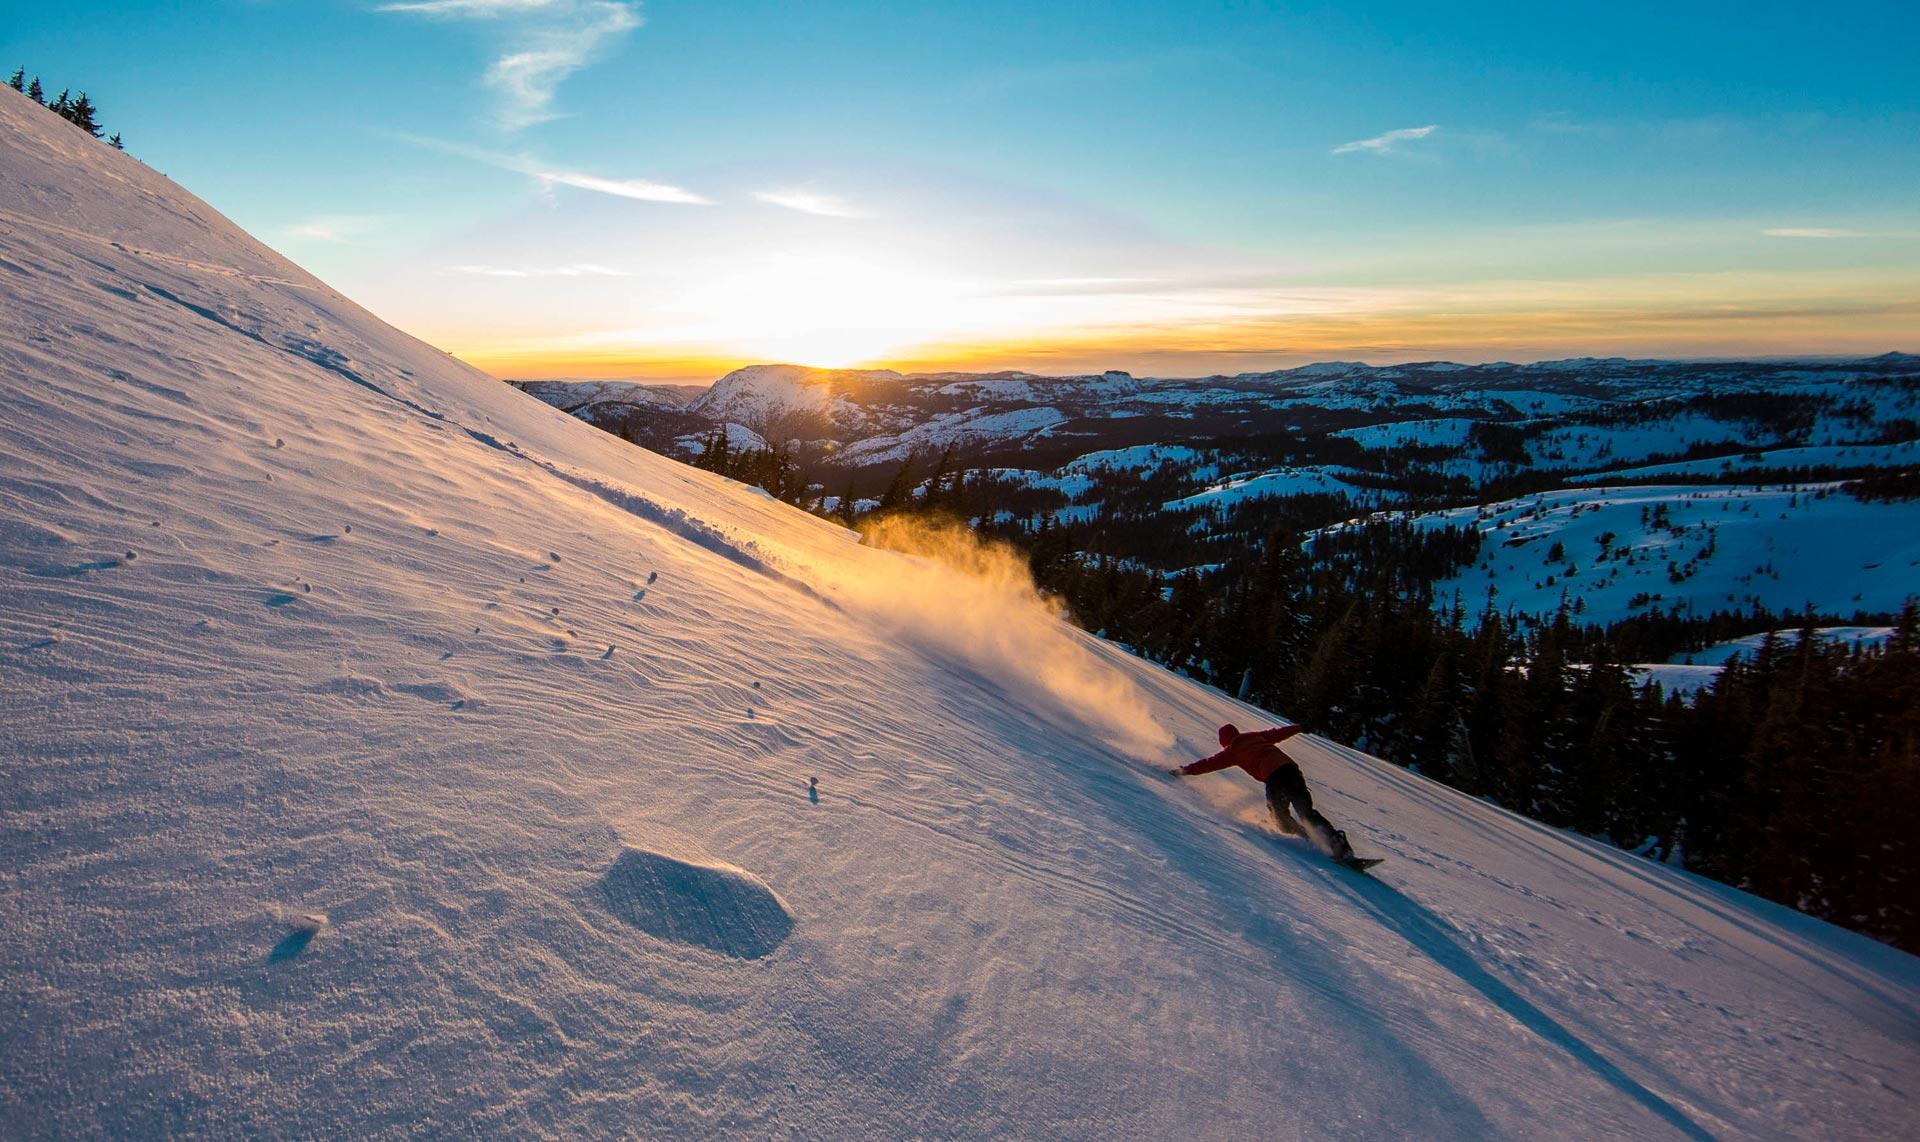 Jeremy Jones - Powder am lake Tahoe